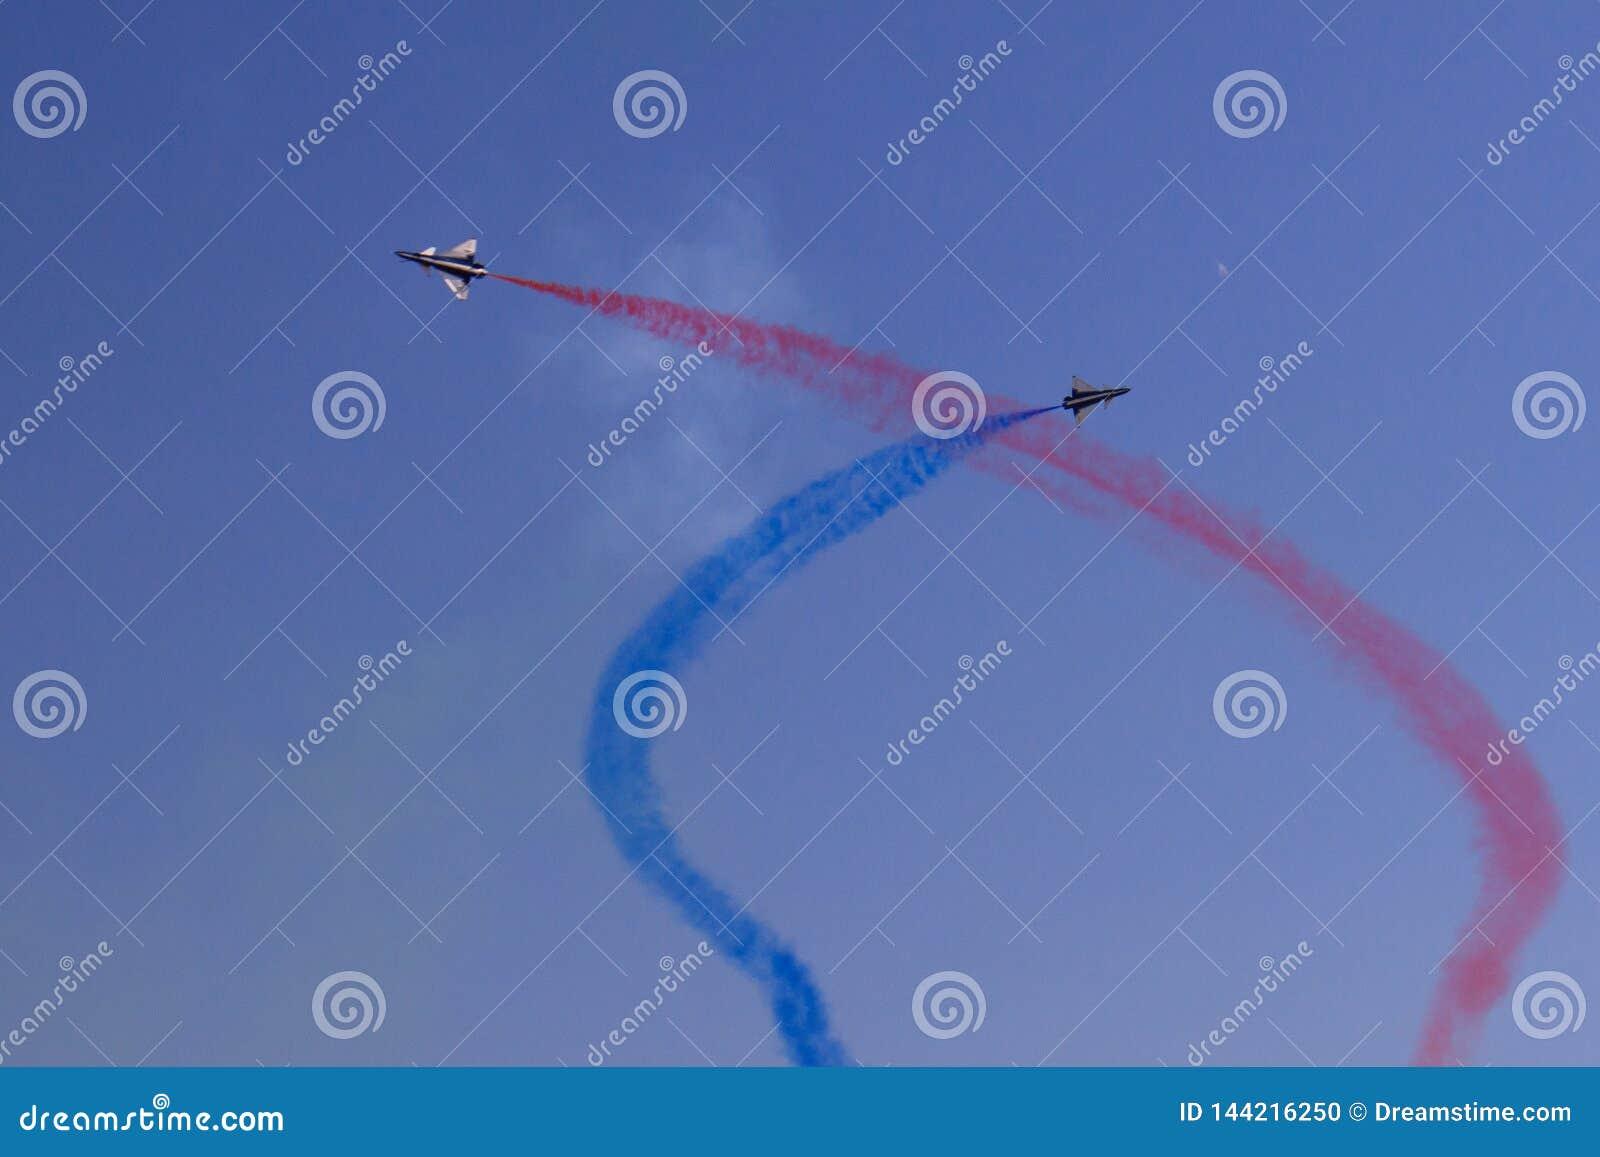 Equipo aeroacrobacia chino